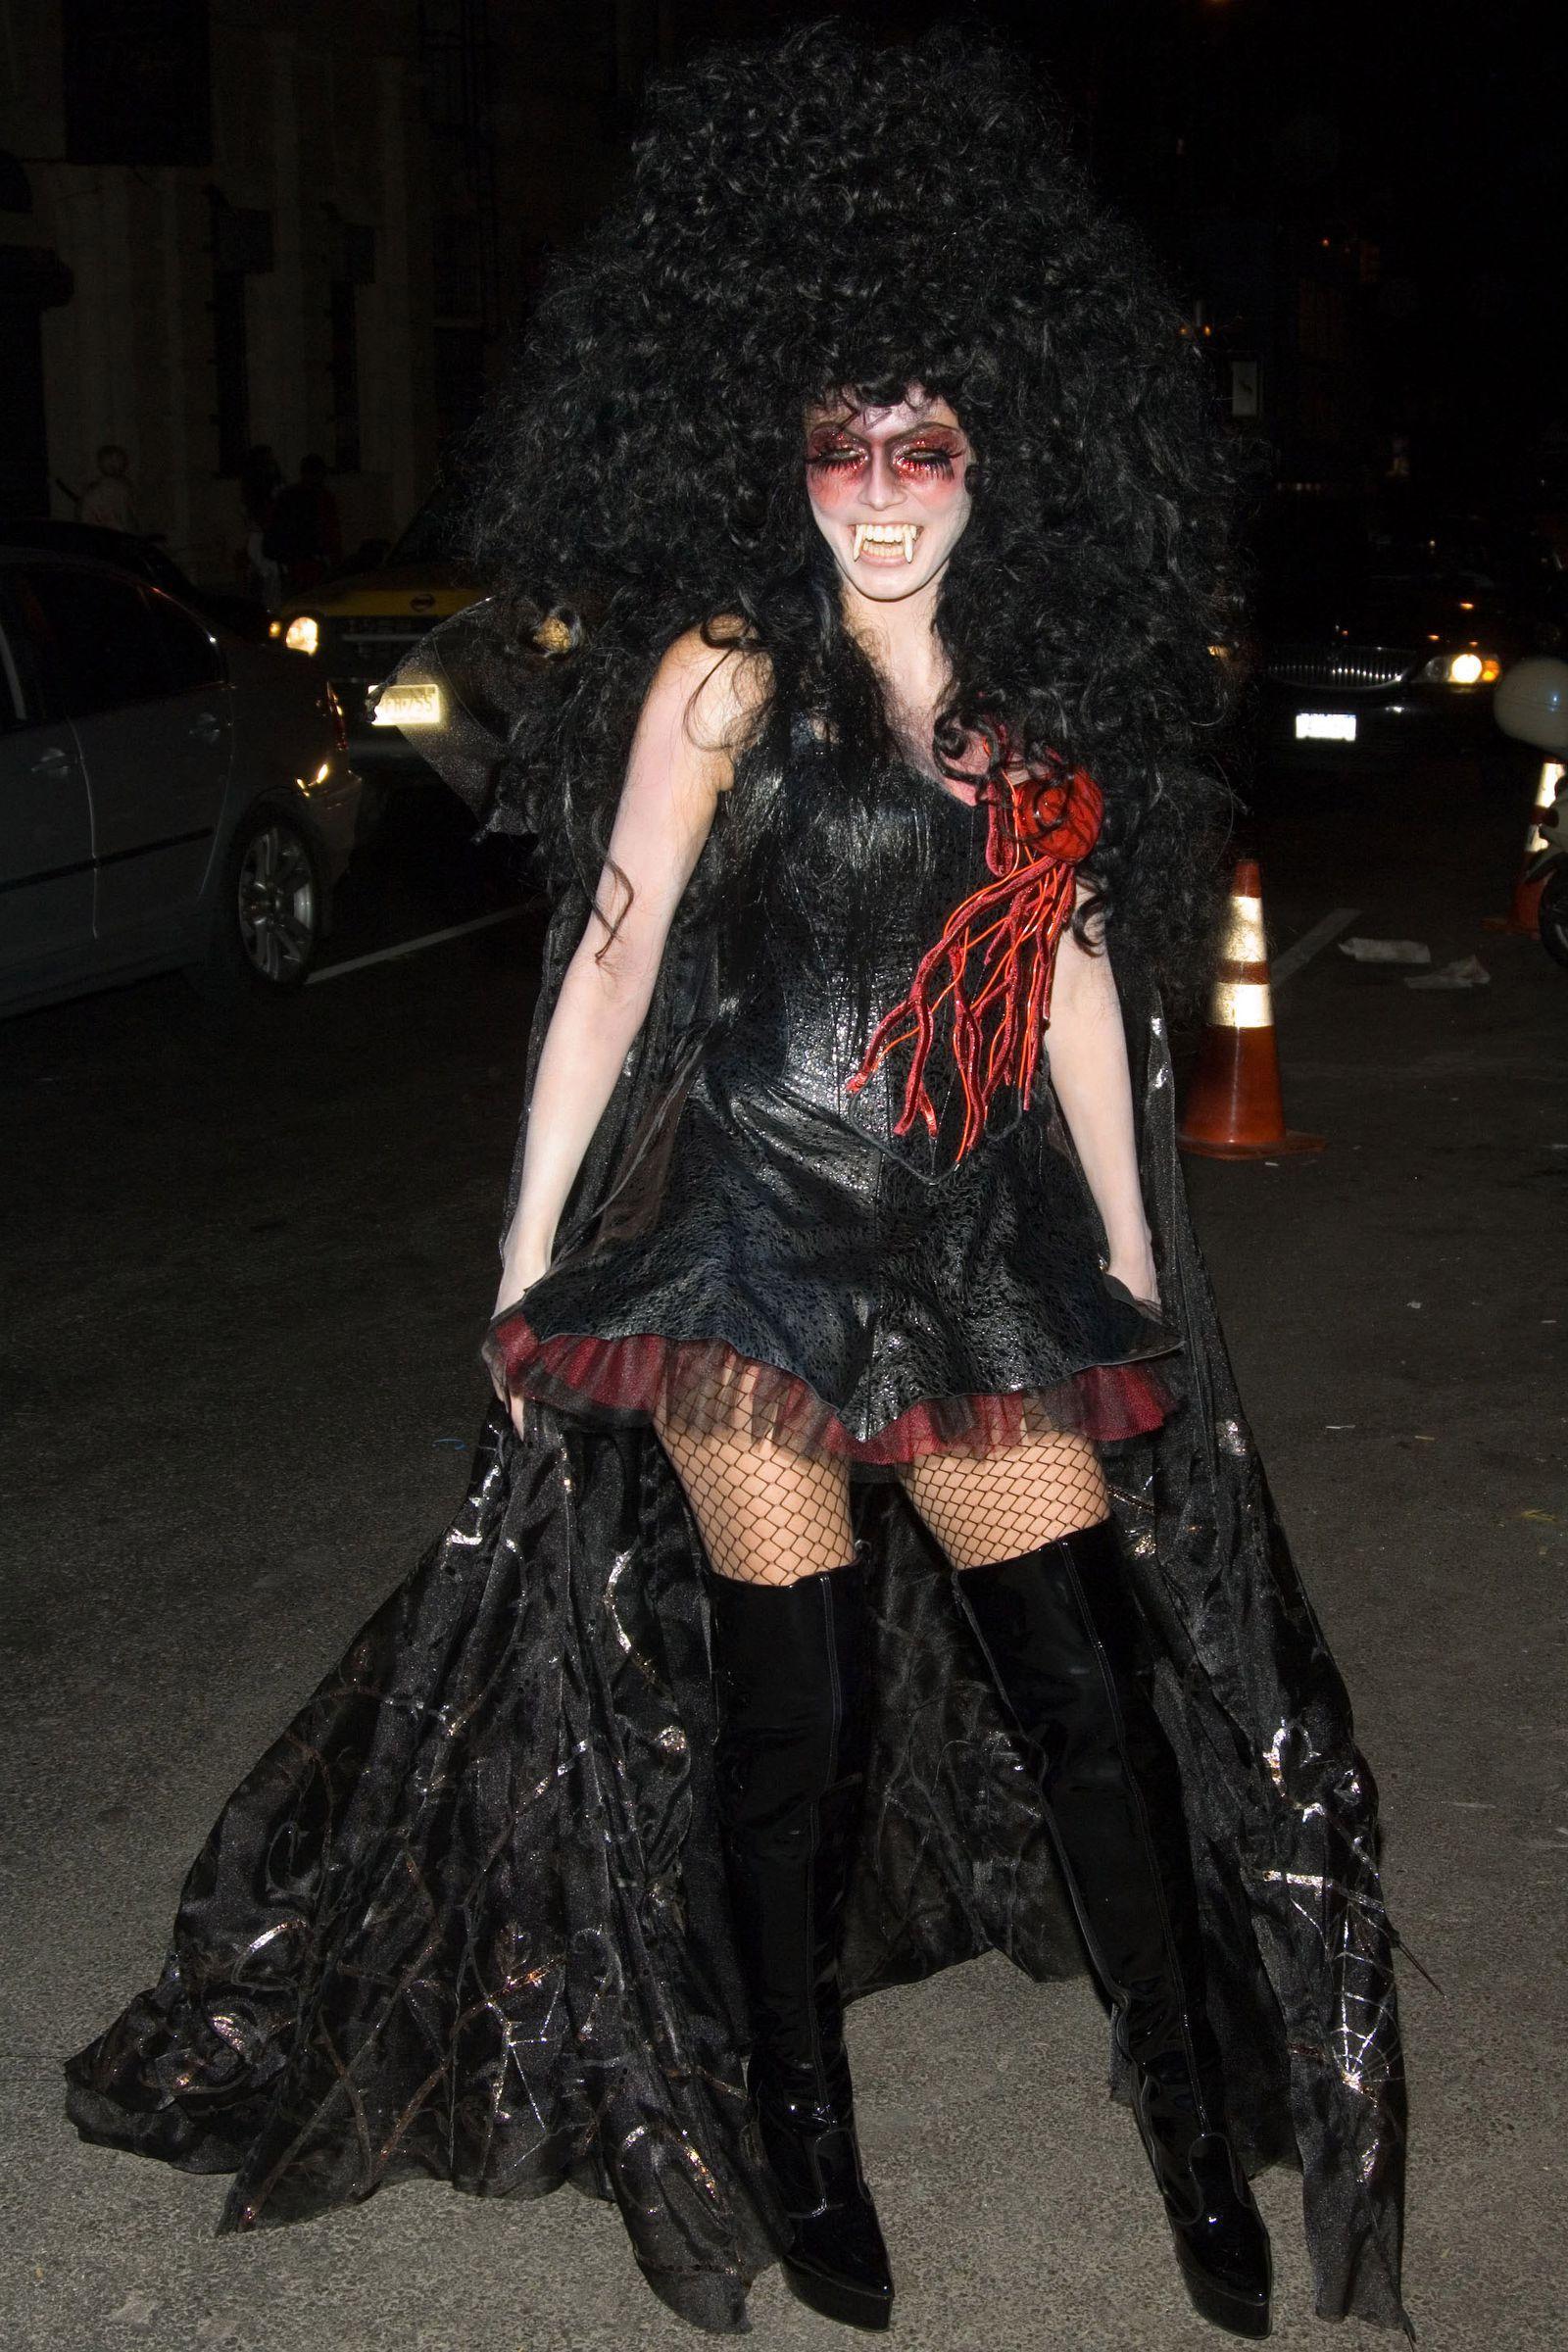 From dominatrix to shrek heidi klum has won halloween every year